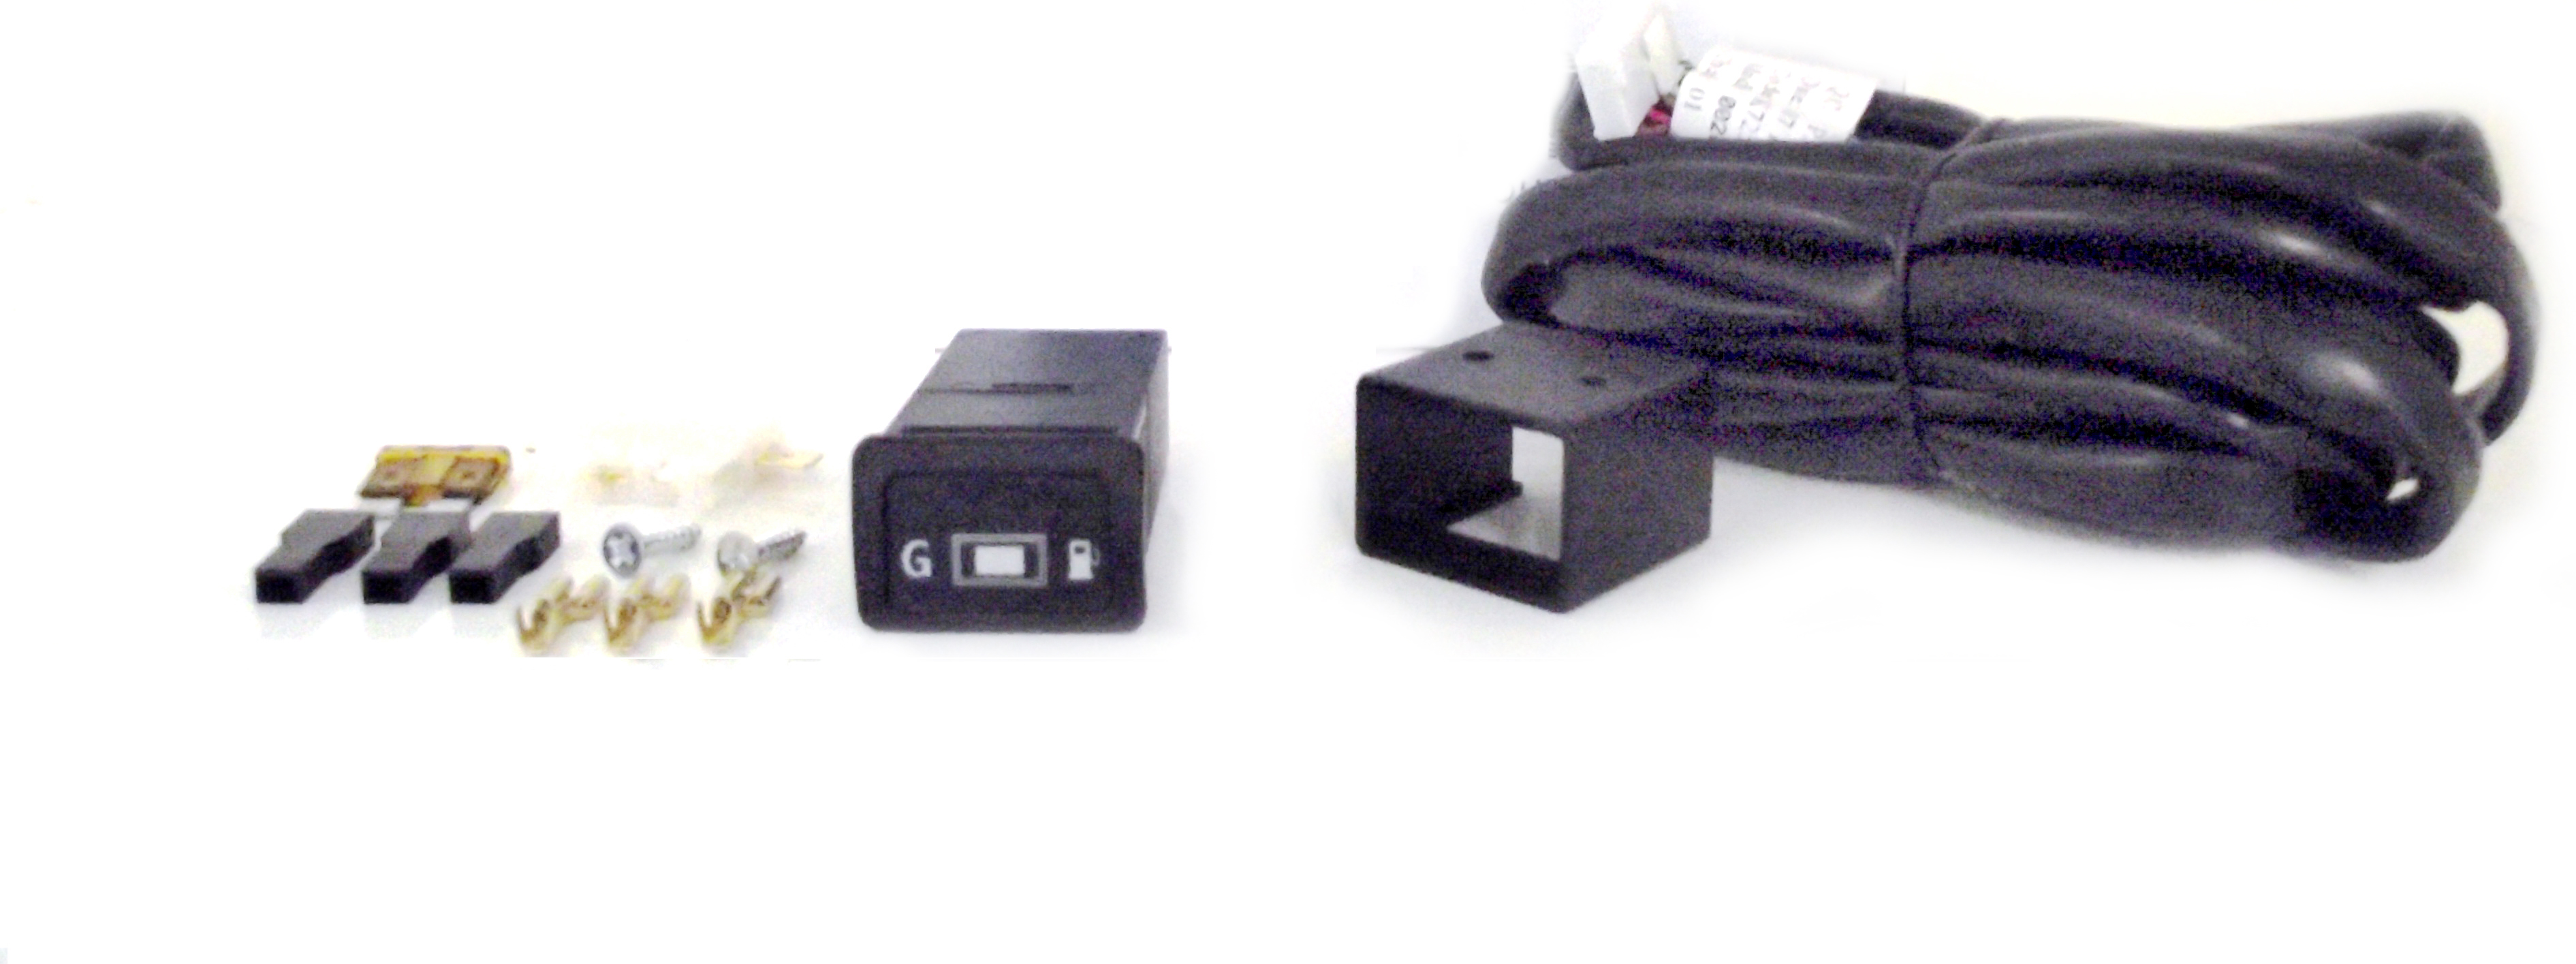 lpg switch aeb725 vlandgas. Black Bedroom Furniture Sets. Home Design Ideas